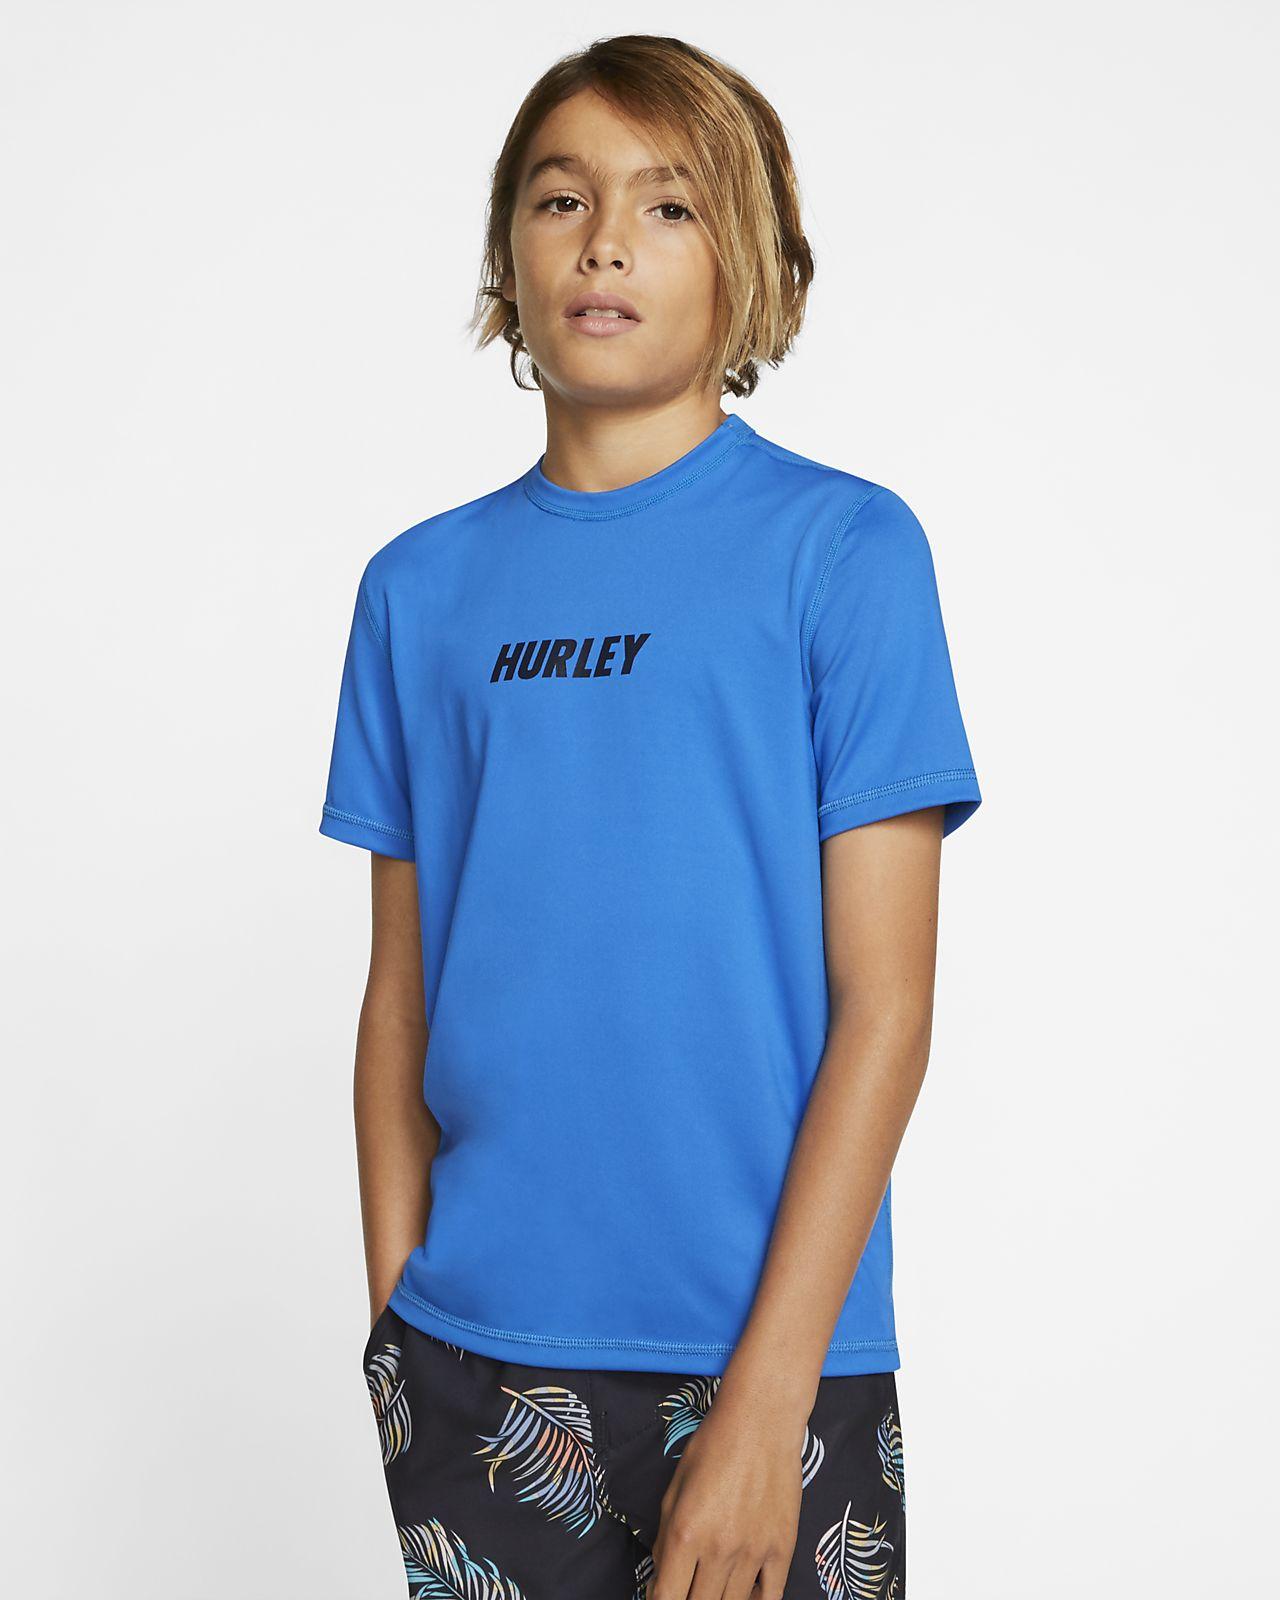 Hurley Fastlane Boys' Short-Sleeve Surf Top